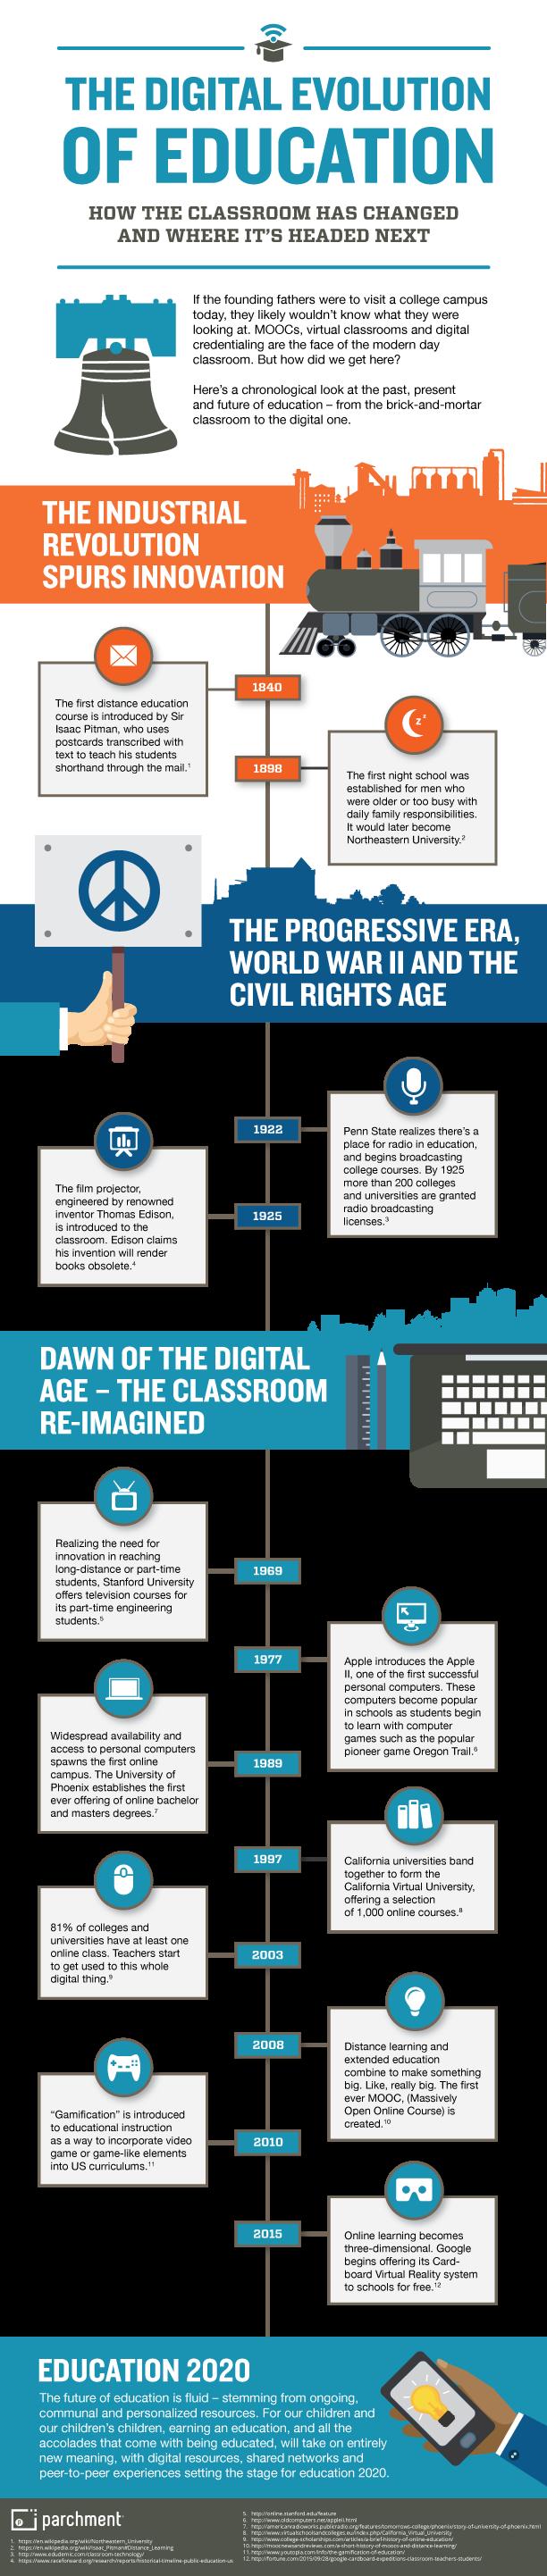 Digital Evolution of Education